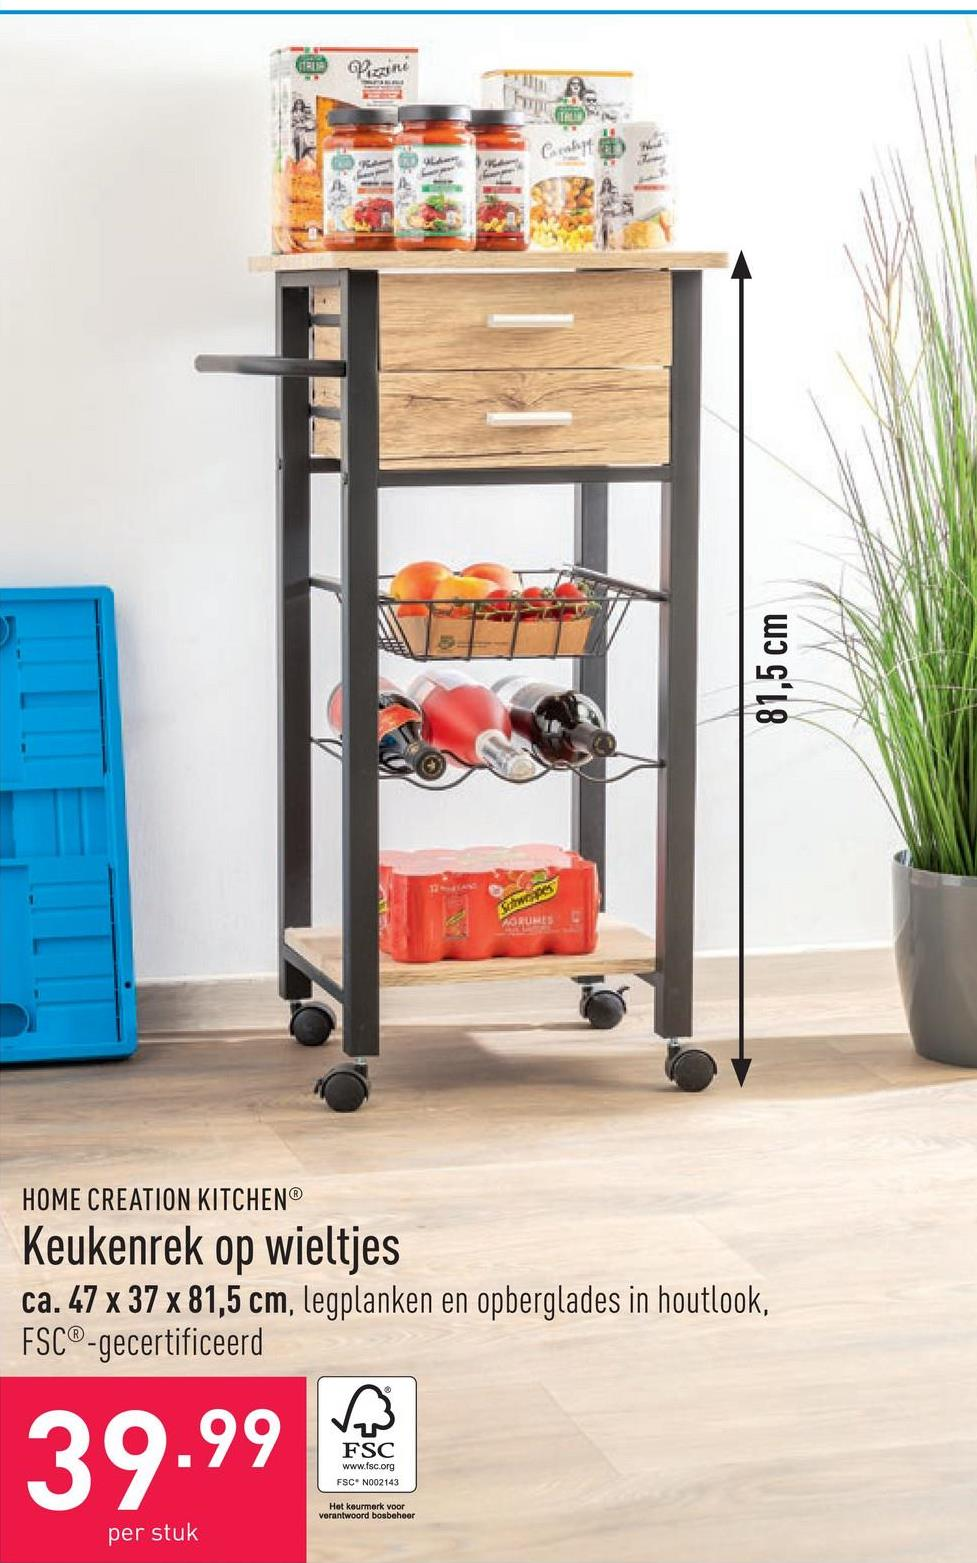 Keukenrek op wieltjes ca. 47 x 37 x 81,5 cm, legplanken en opberglades in houtlook, FSC®-gecertificeerd